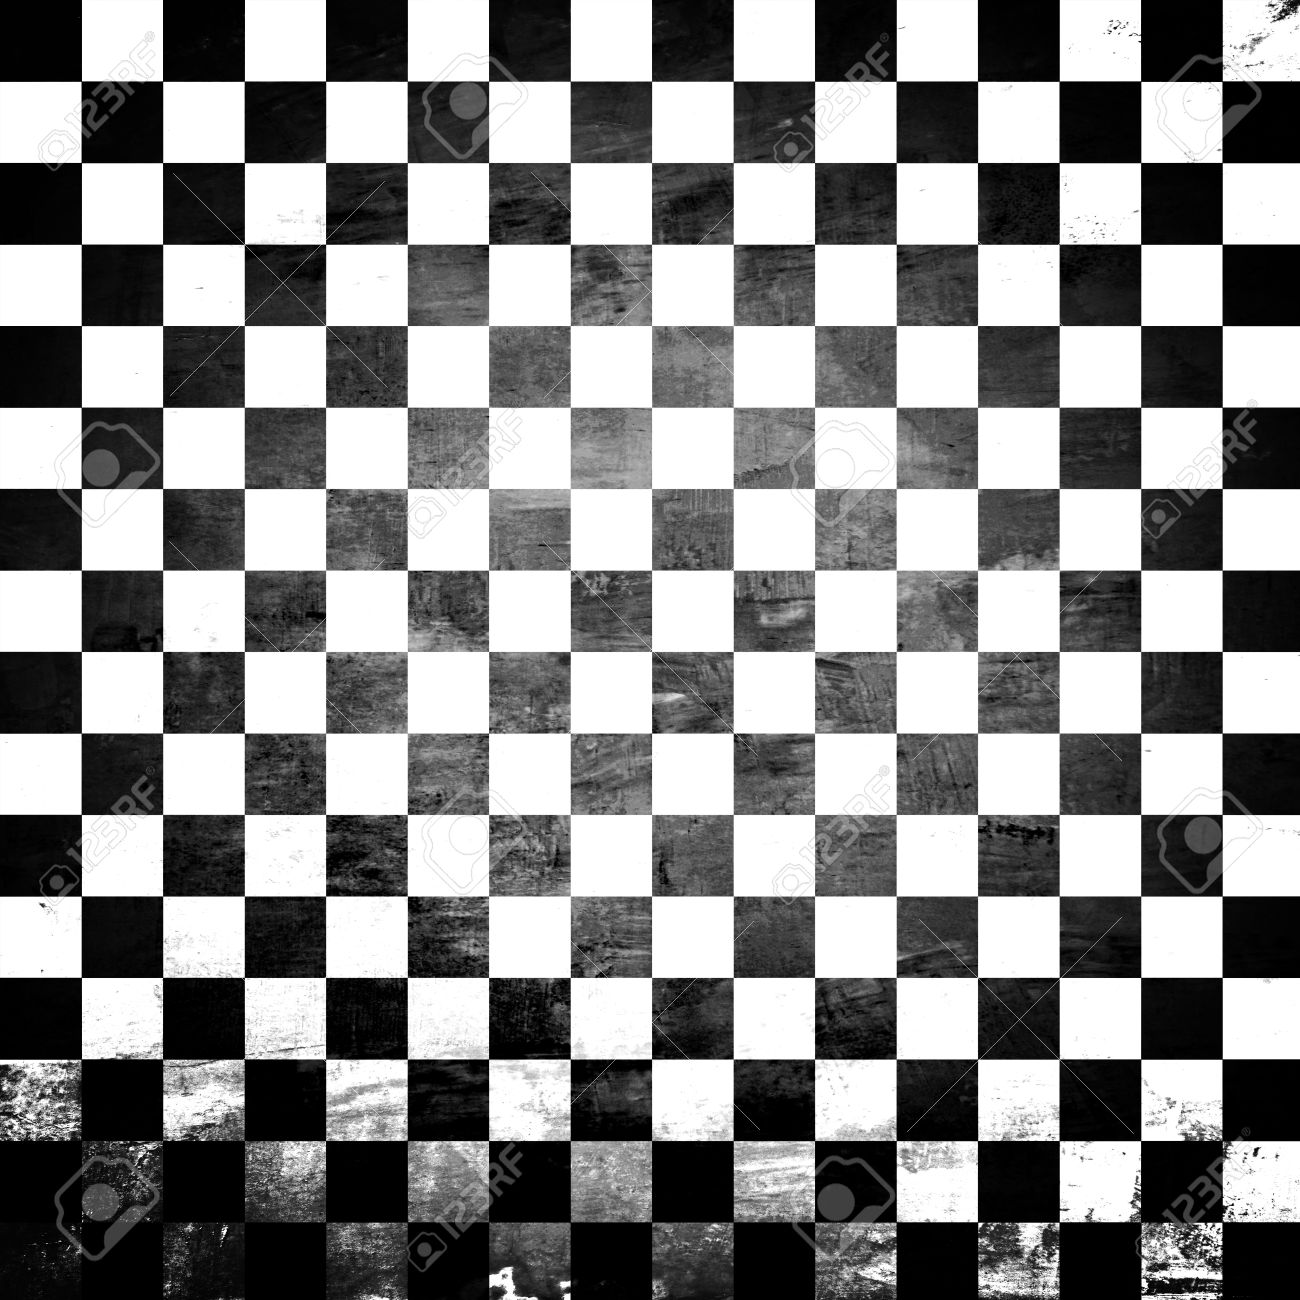 Grunge abstract black   white checkered background Stock Photo - 20645853